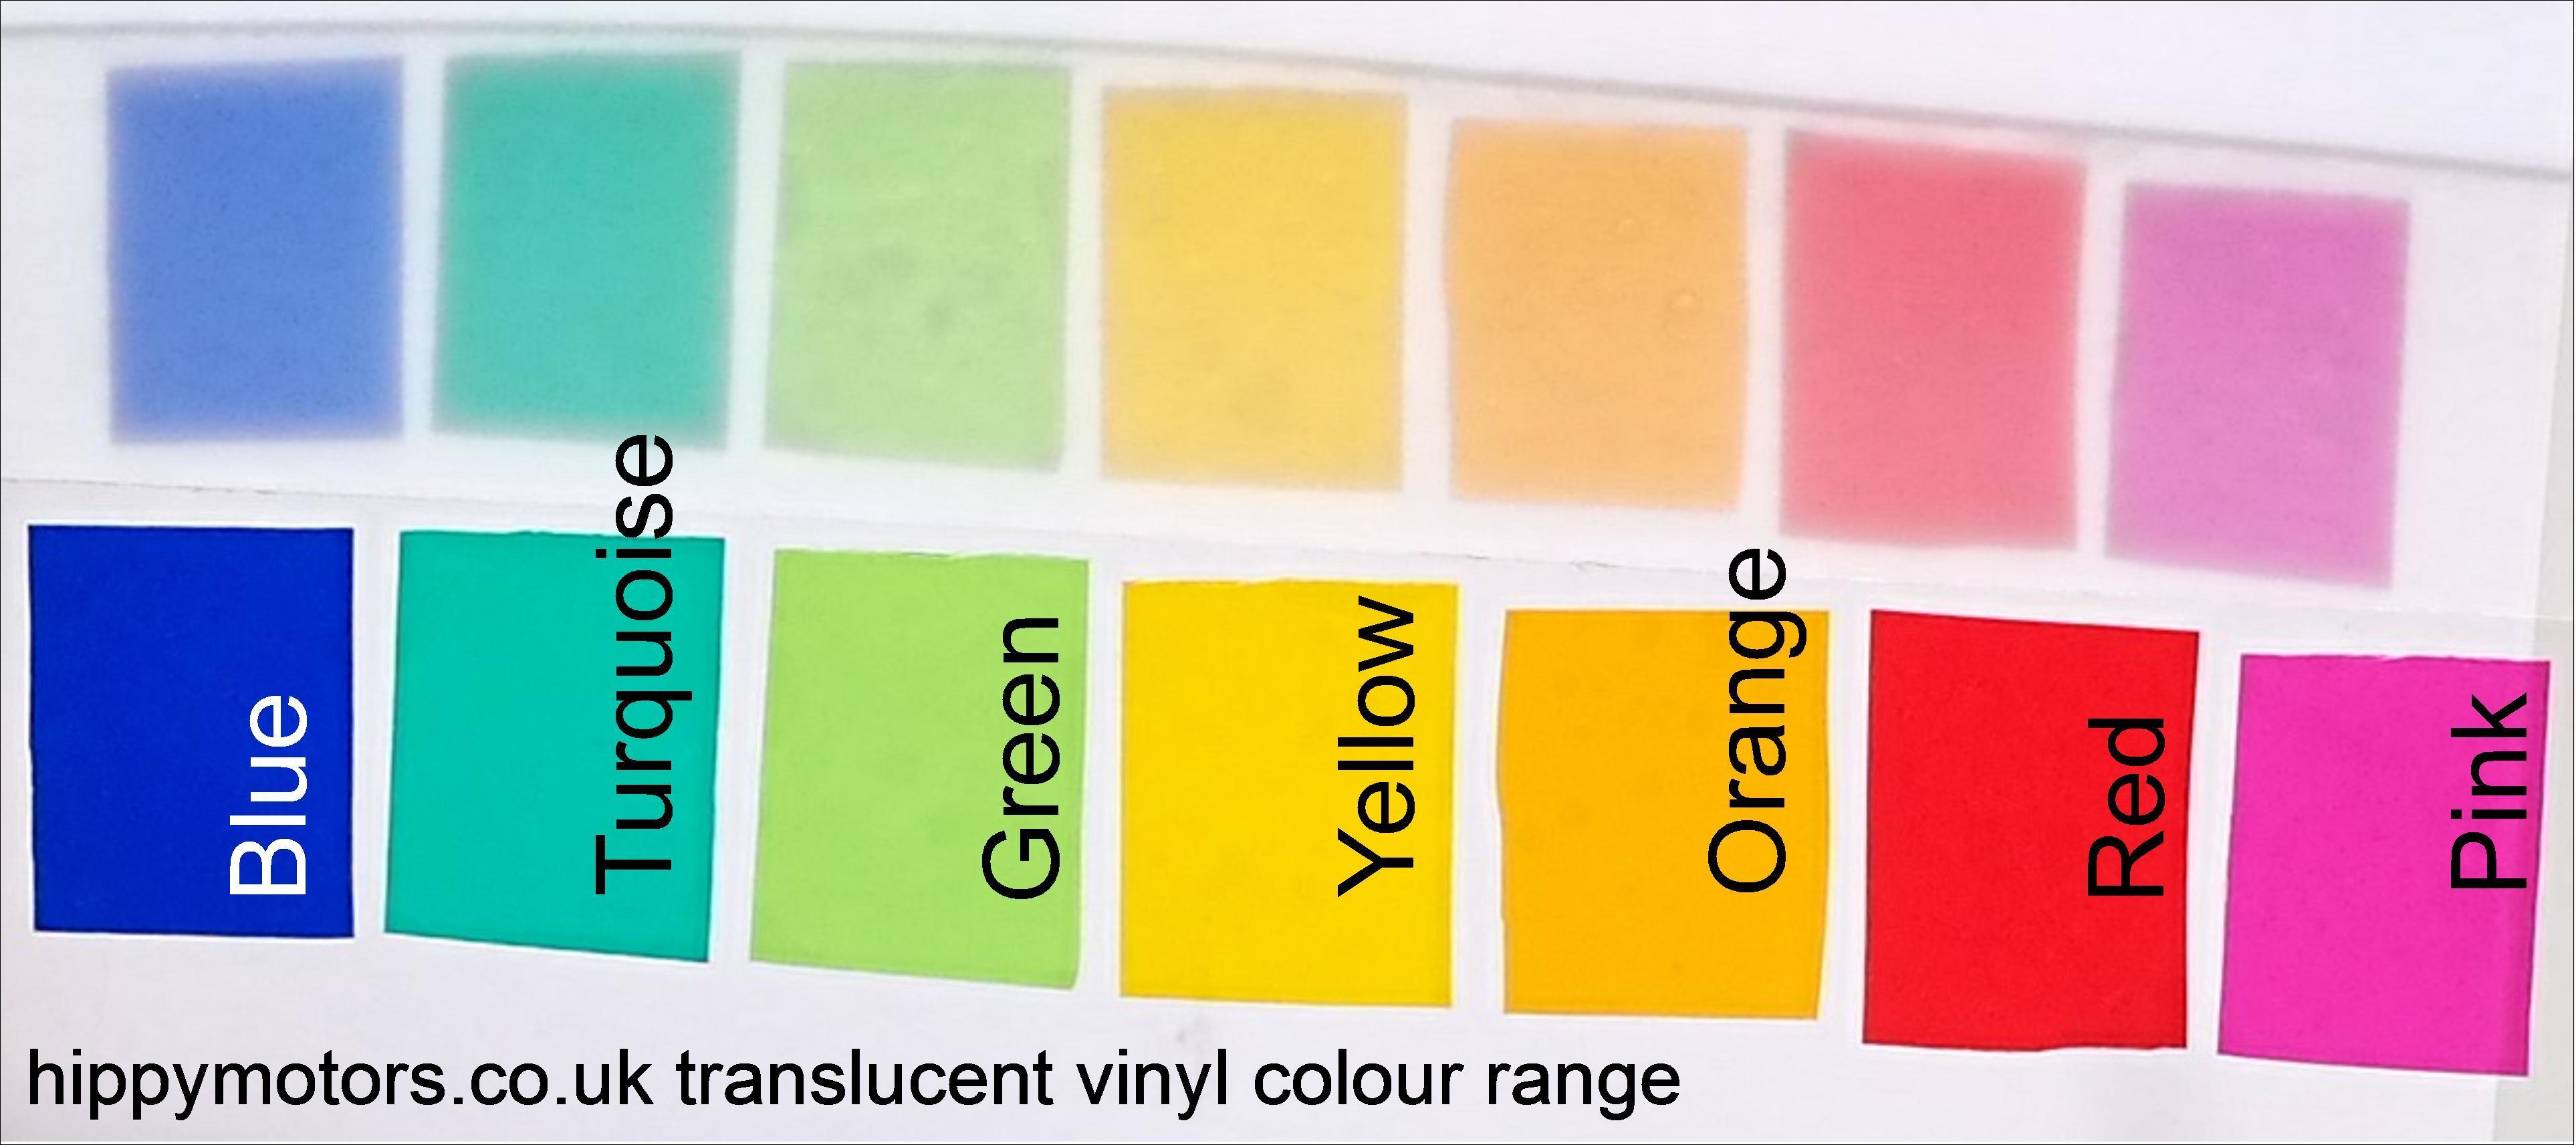 hippymotors-translucent-vinyl-colour-chart.jpg